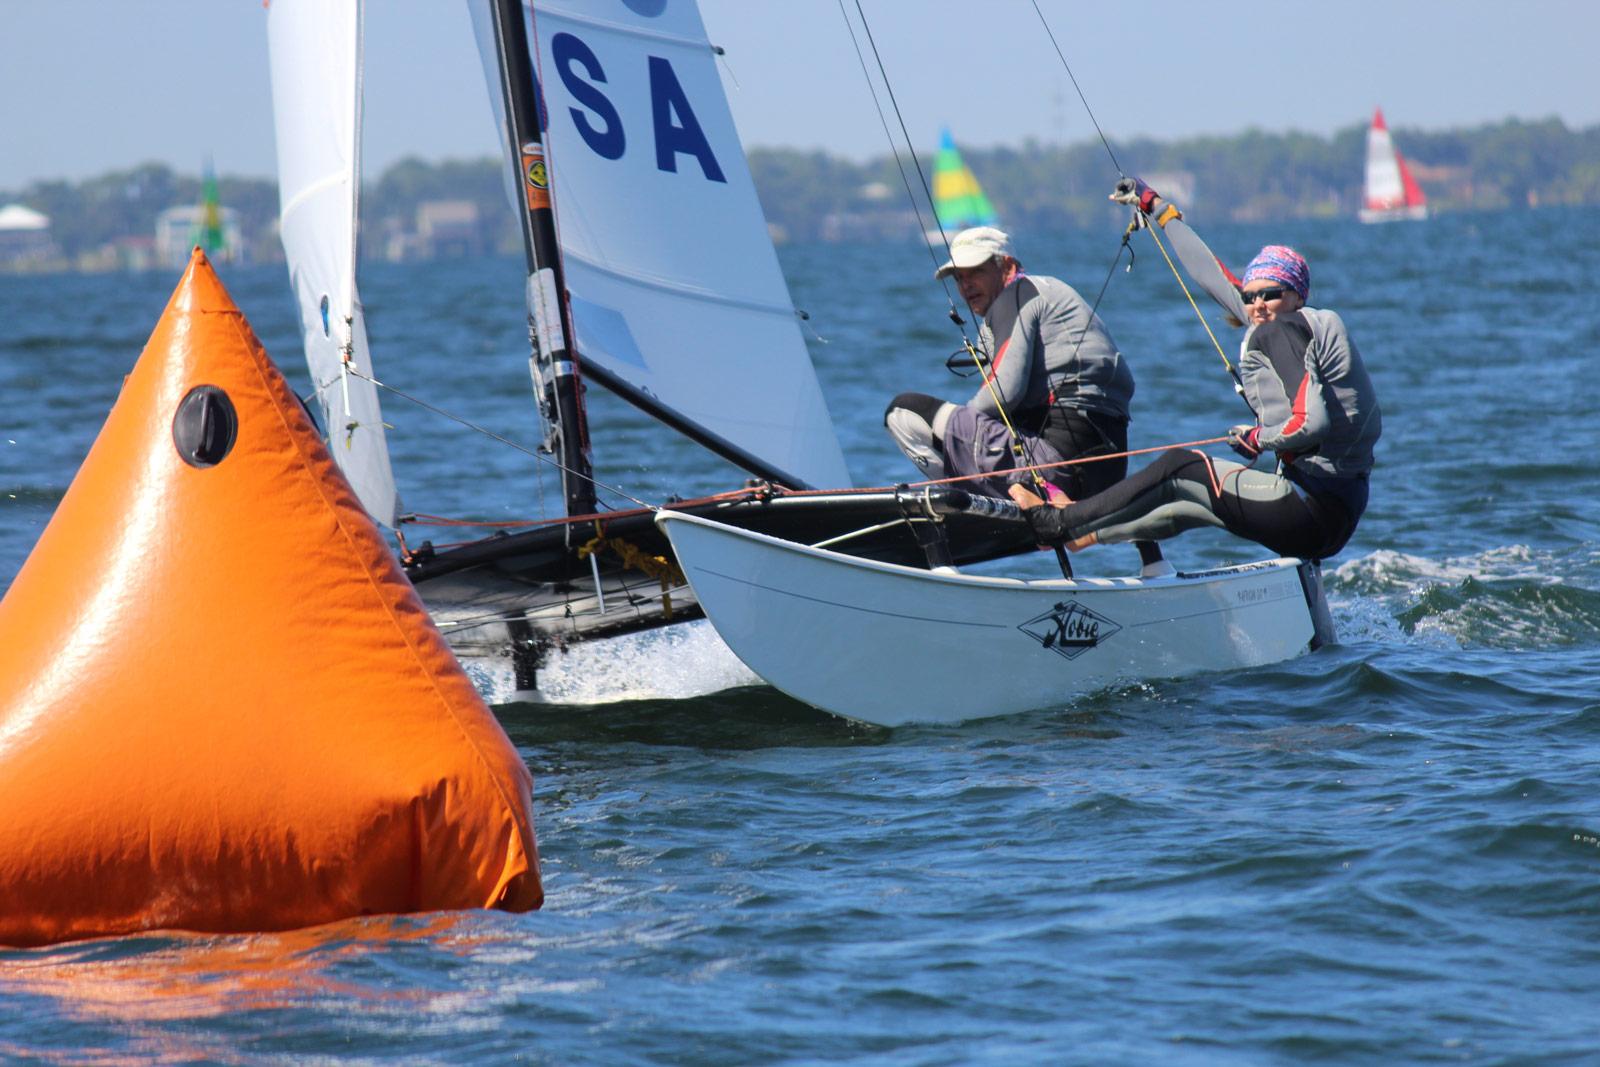 2015 Hobie 16 NA Championships - Silver Fleet Winners - Adam Atherton and Diane Bisesi